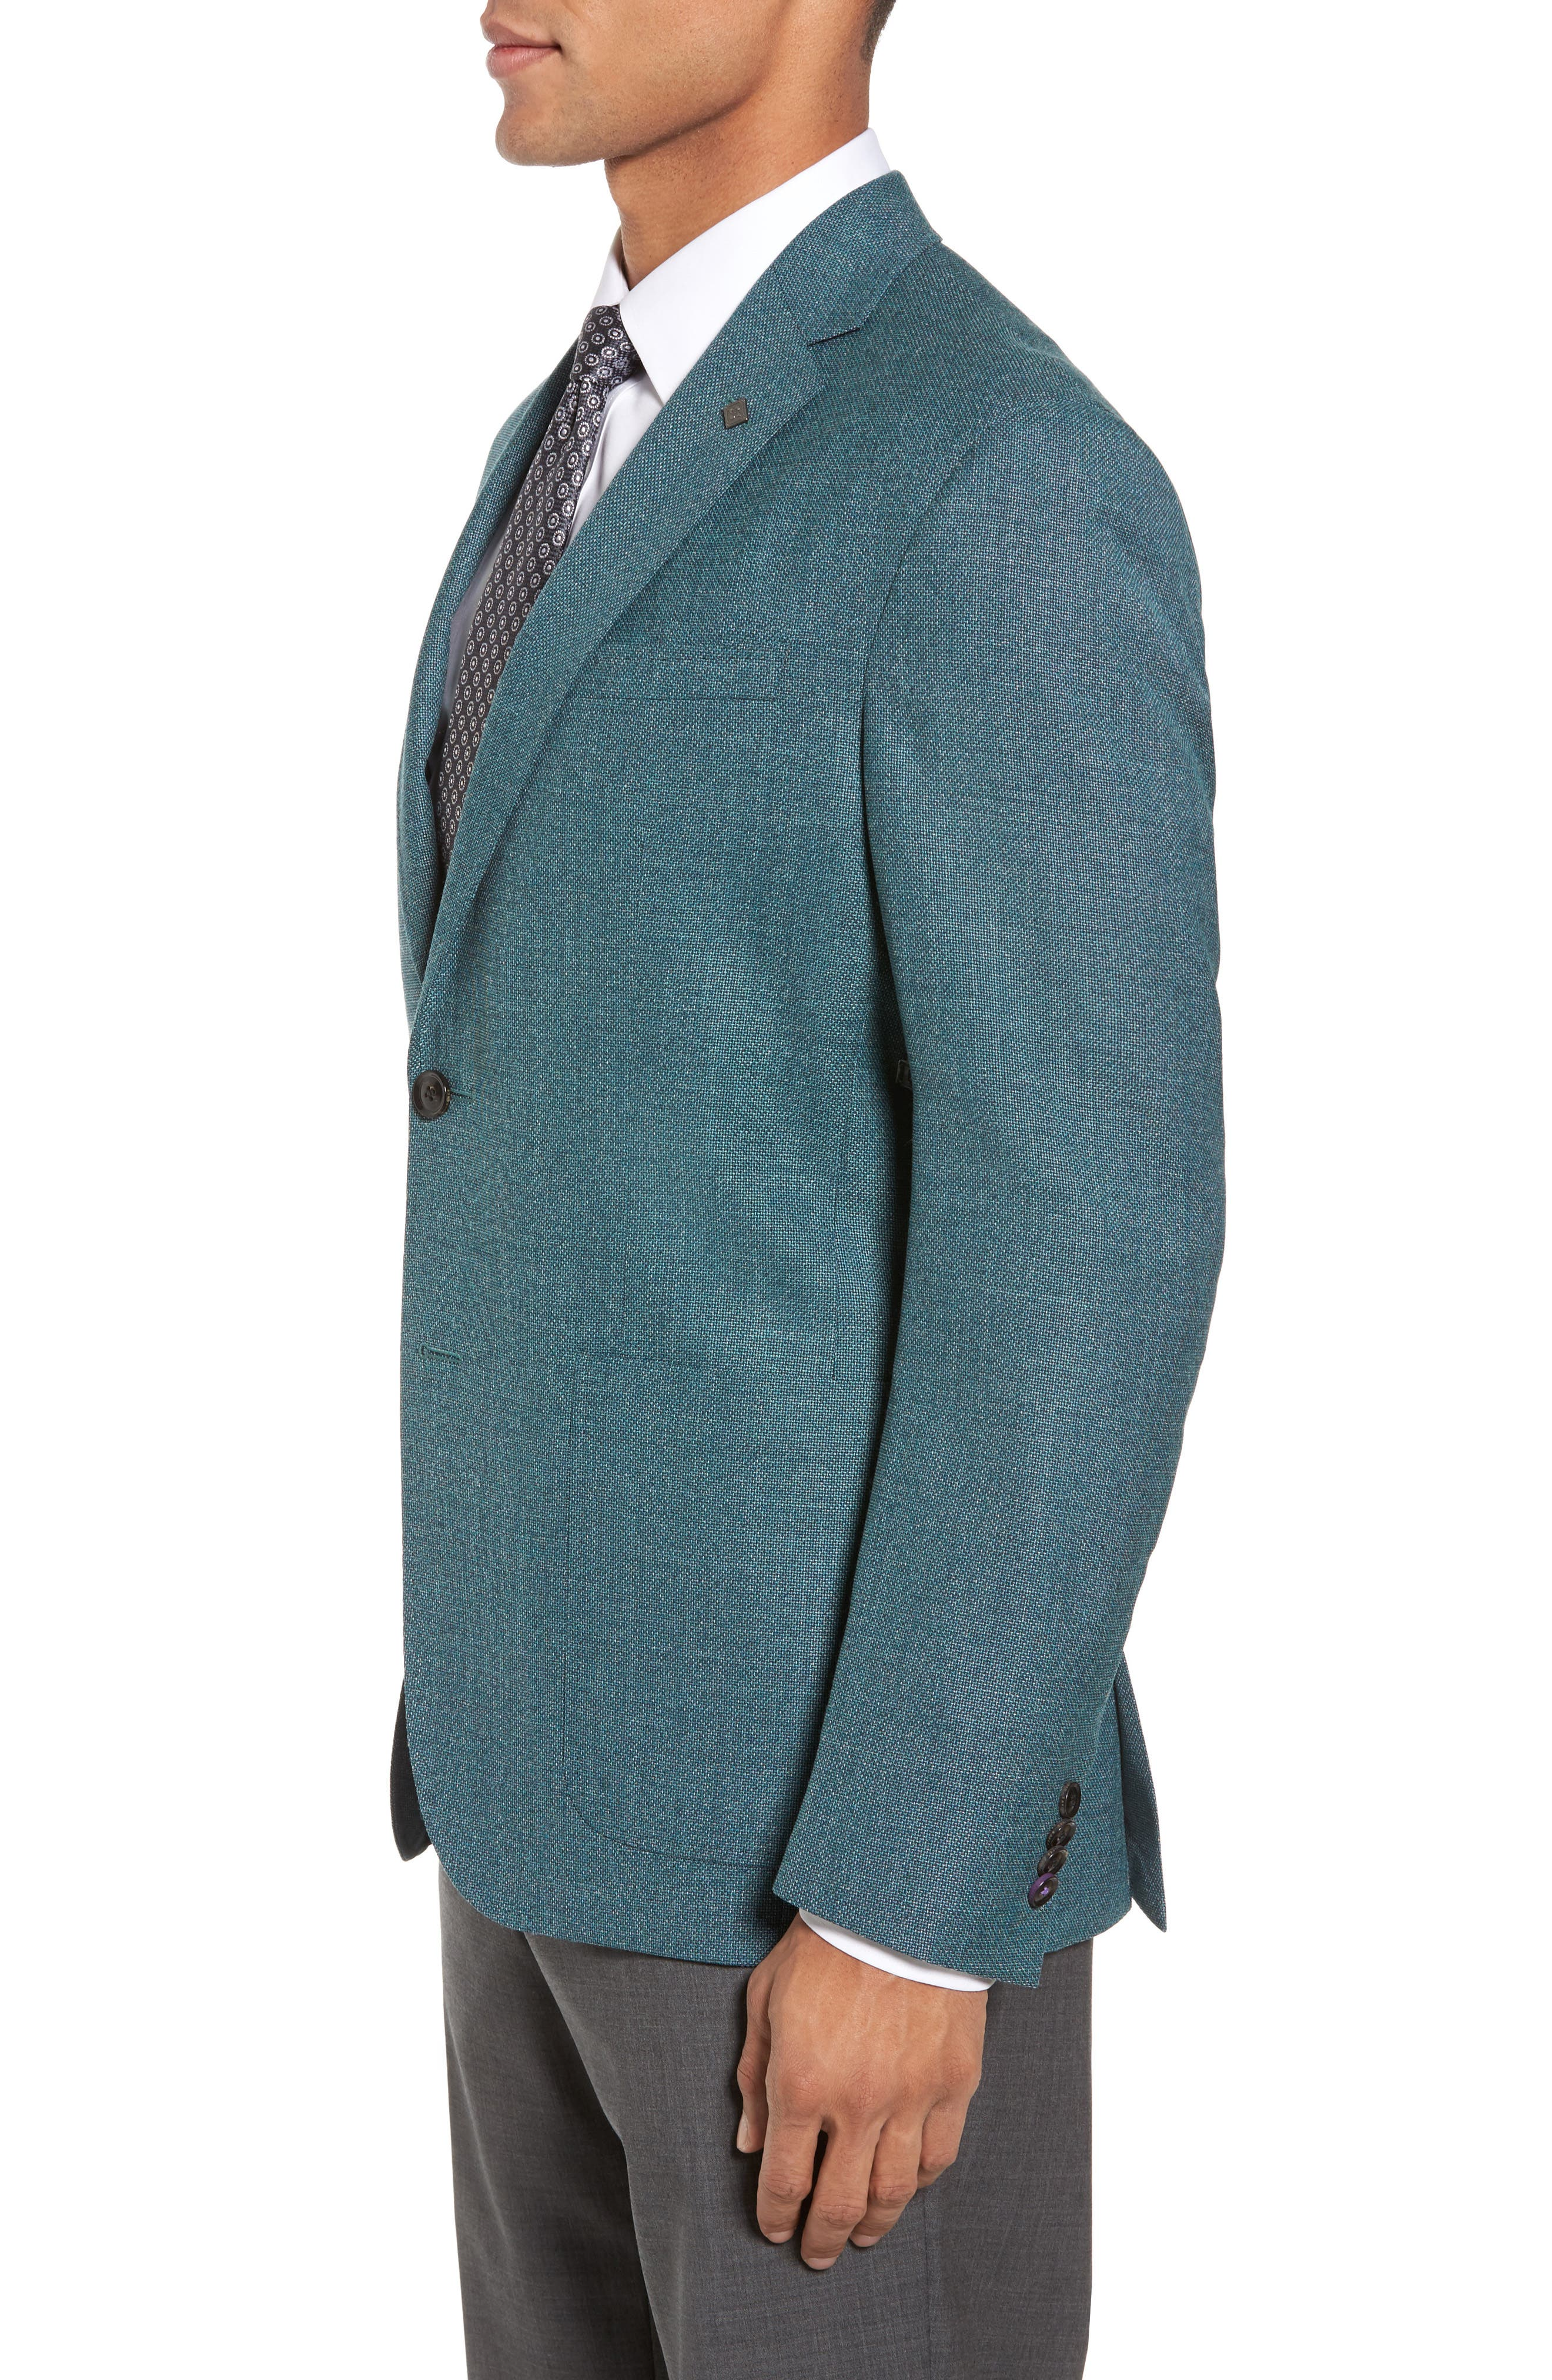 Kyle Trim Fit Wool Blazer,                             Alternate thumbnail 3, color,                             Teal Blue